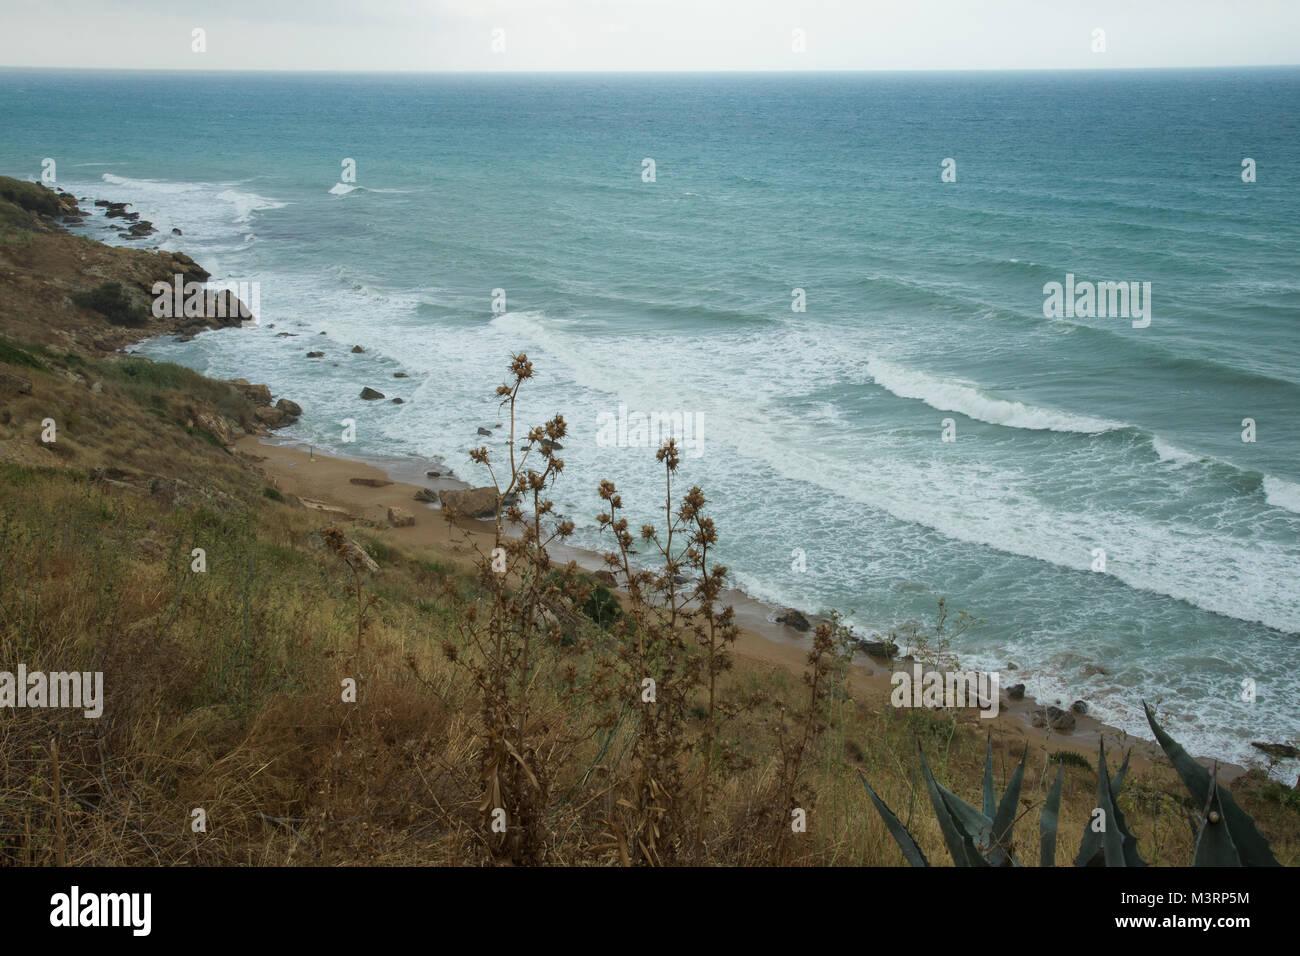 The nature of Calabria - Curmo beach - Stock Image